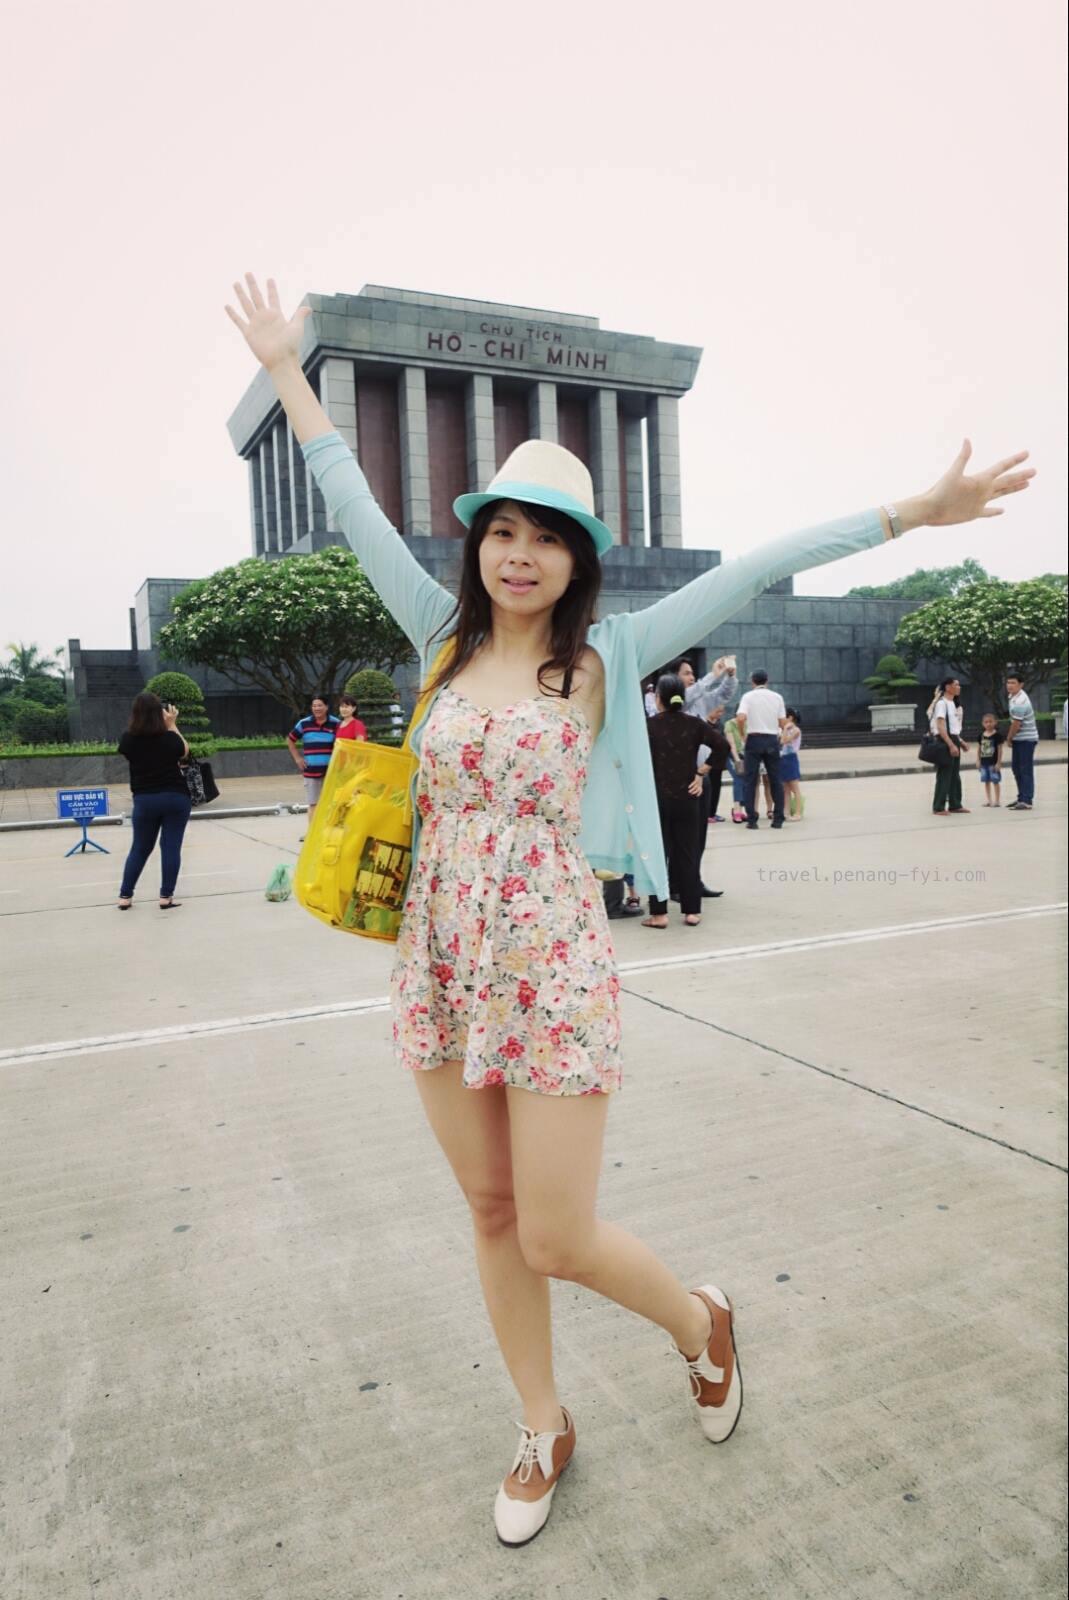 Ho-Chi-Minh-Mausoleum-01